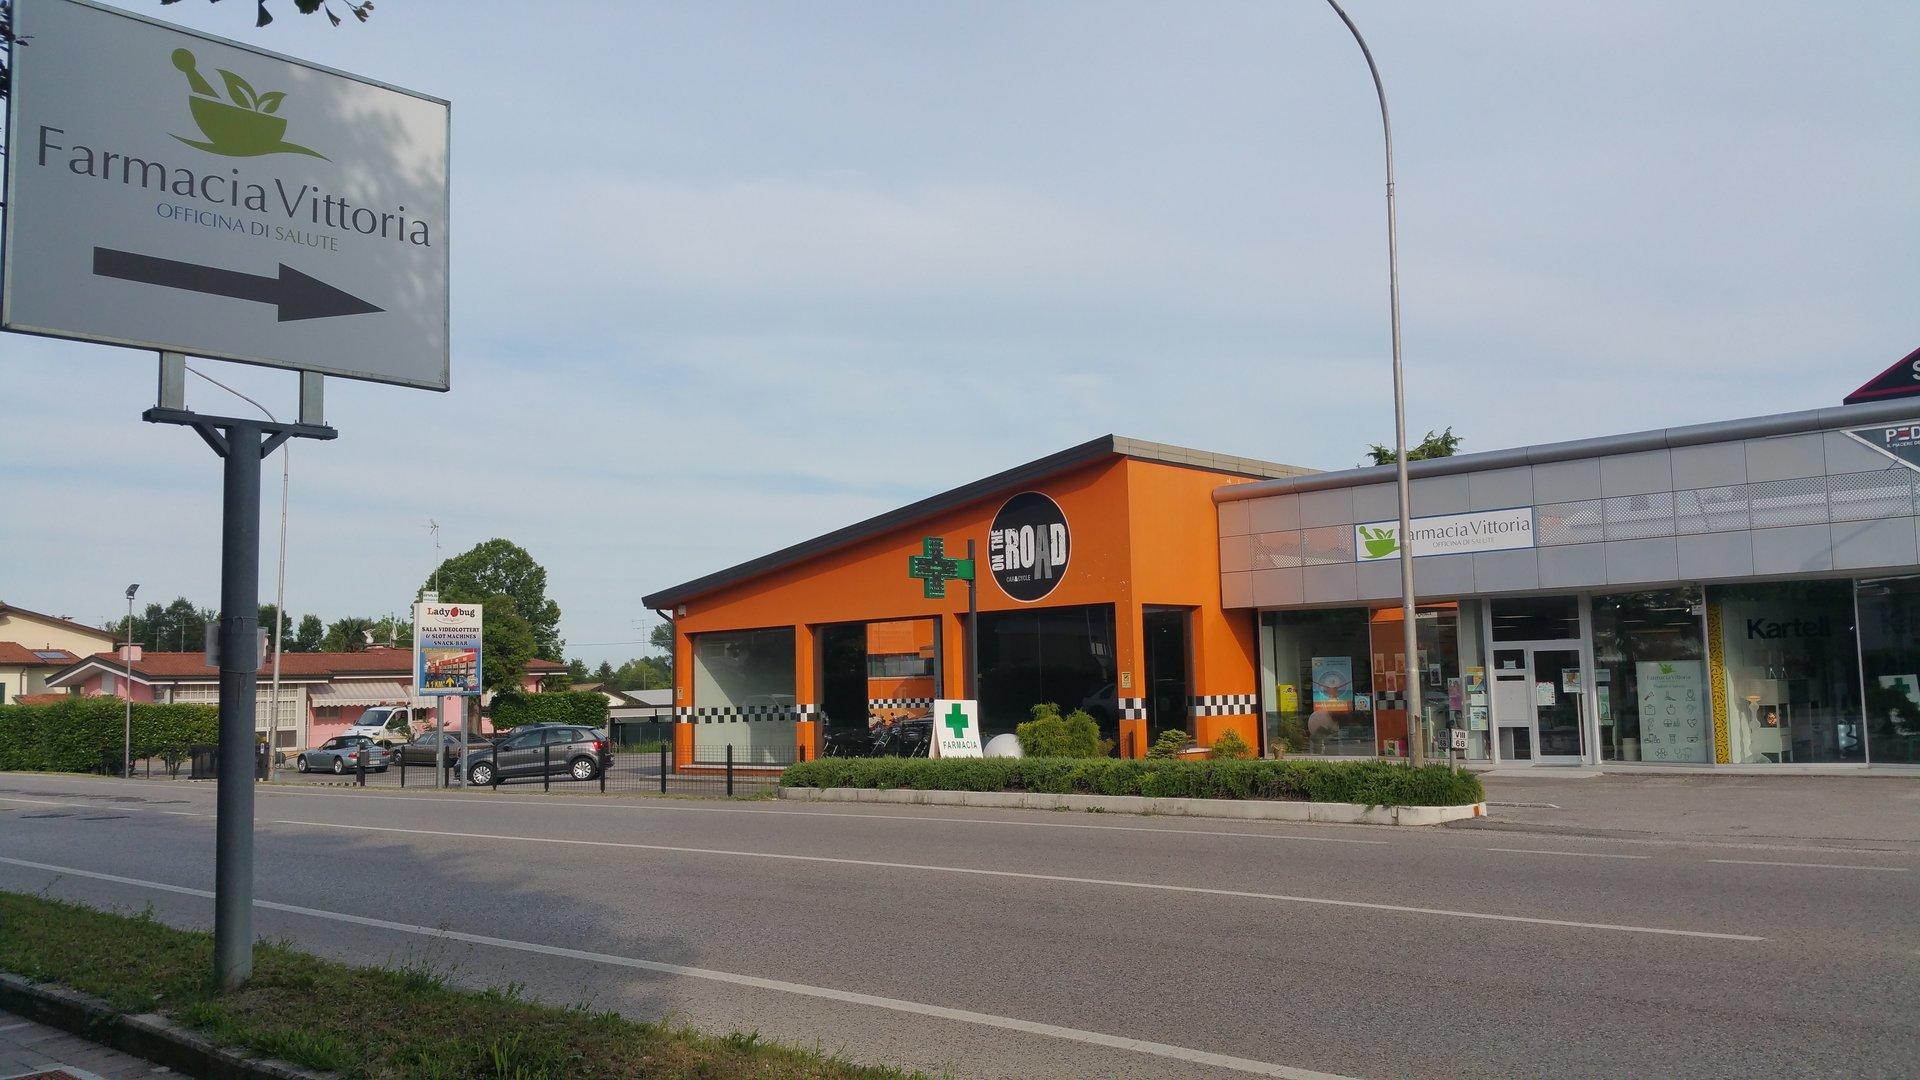 farmacia e strada